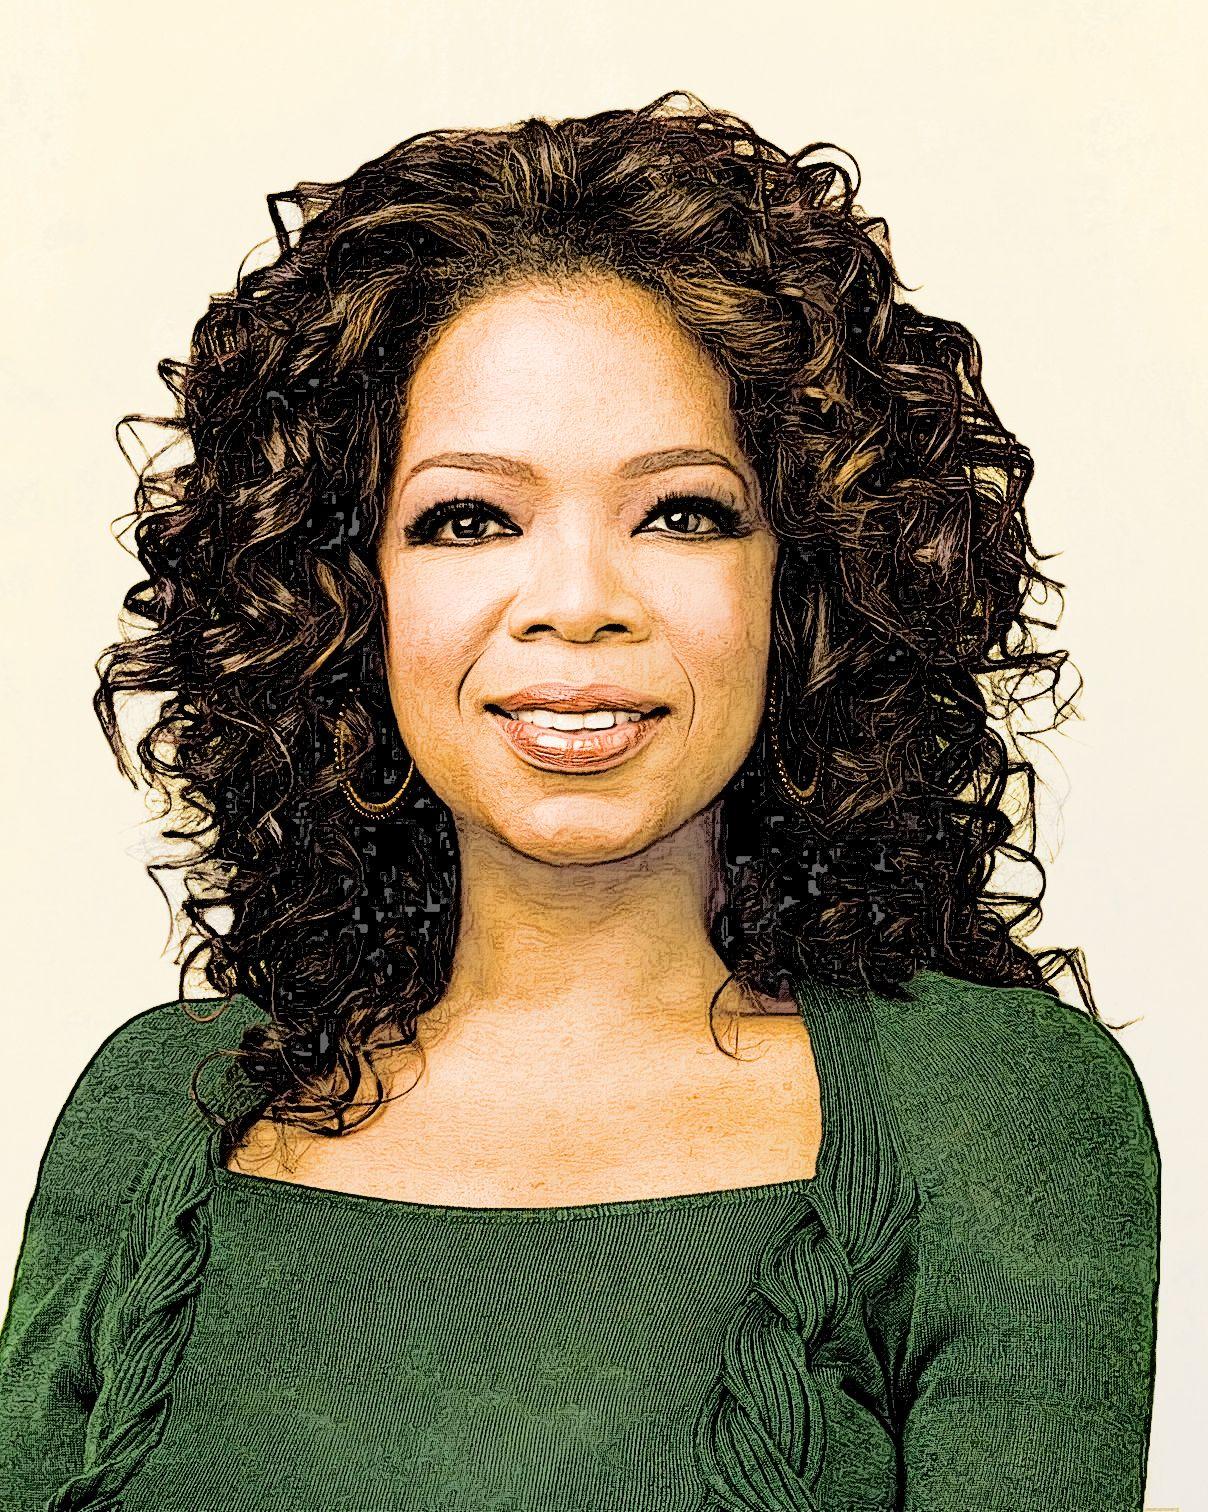 Oprah Oprah Tribute Photoshop Sketch Action Oprah S